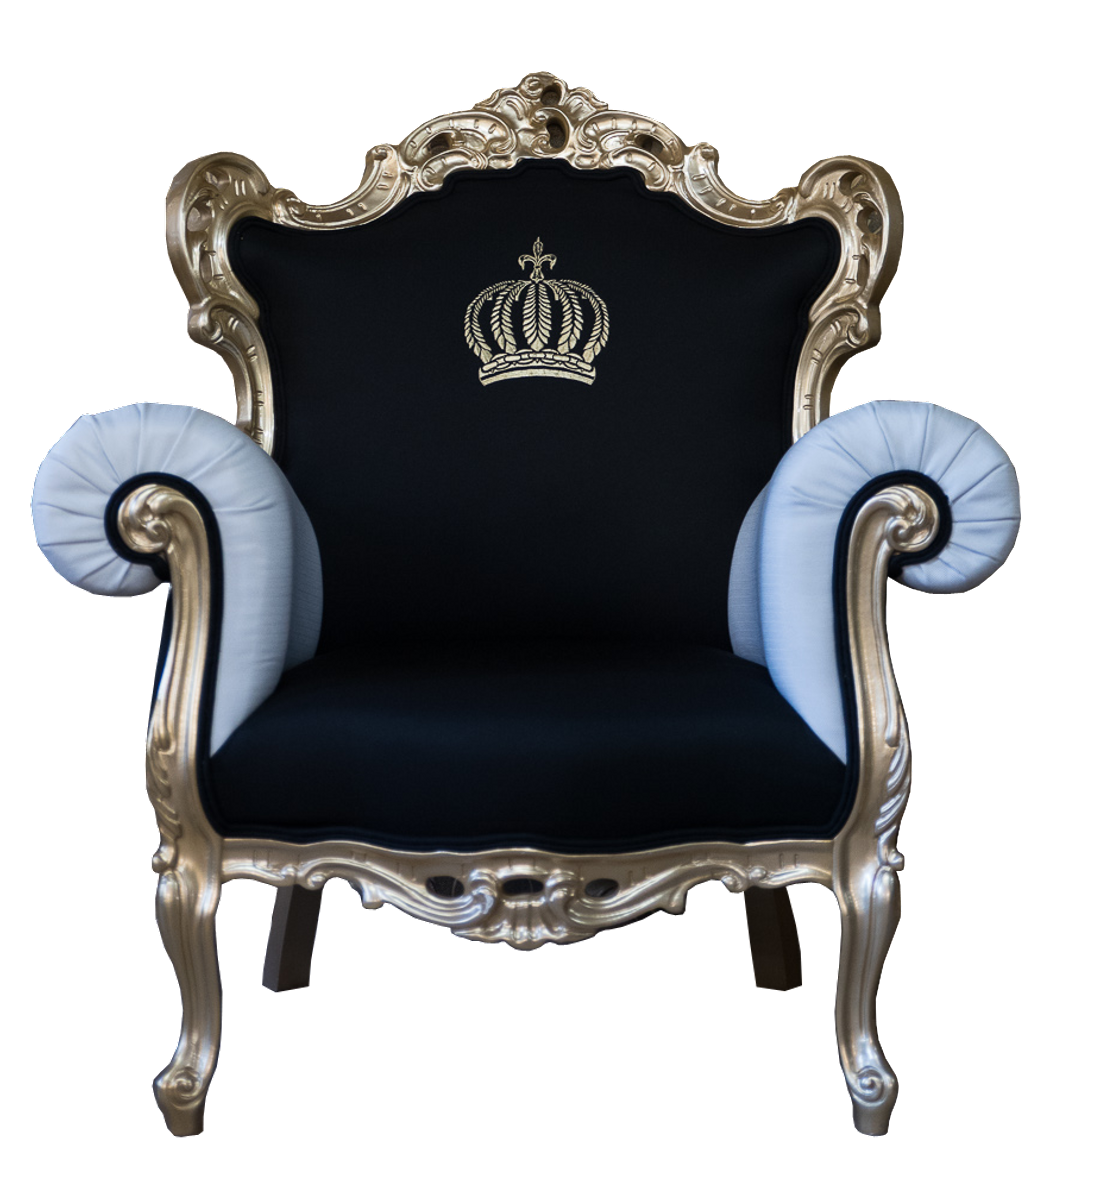 pomp s by casa padrino luxus barock sessel schwarz wei gold pomp ser barock sessel. Black Bedroom Furniture Sets. Home Design Ideas